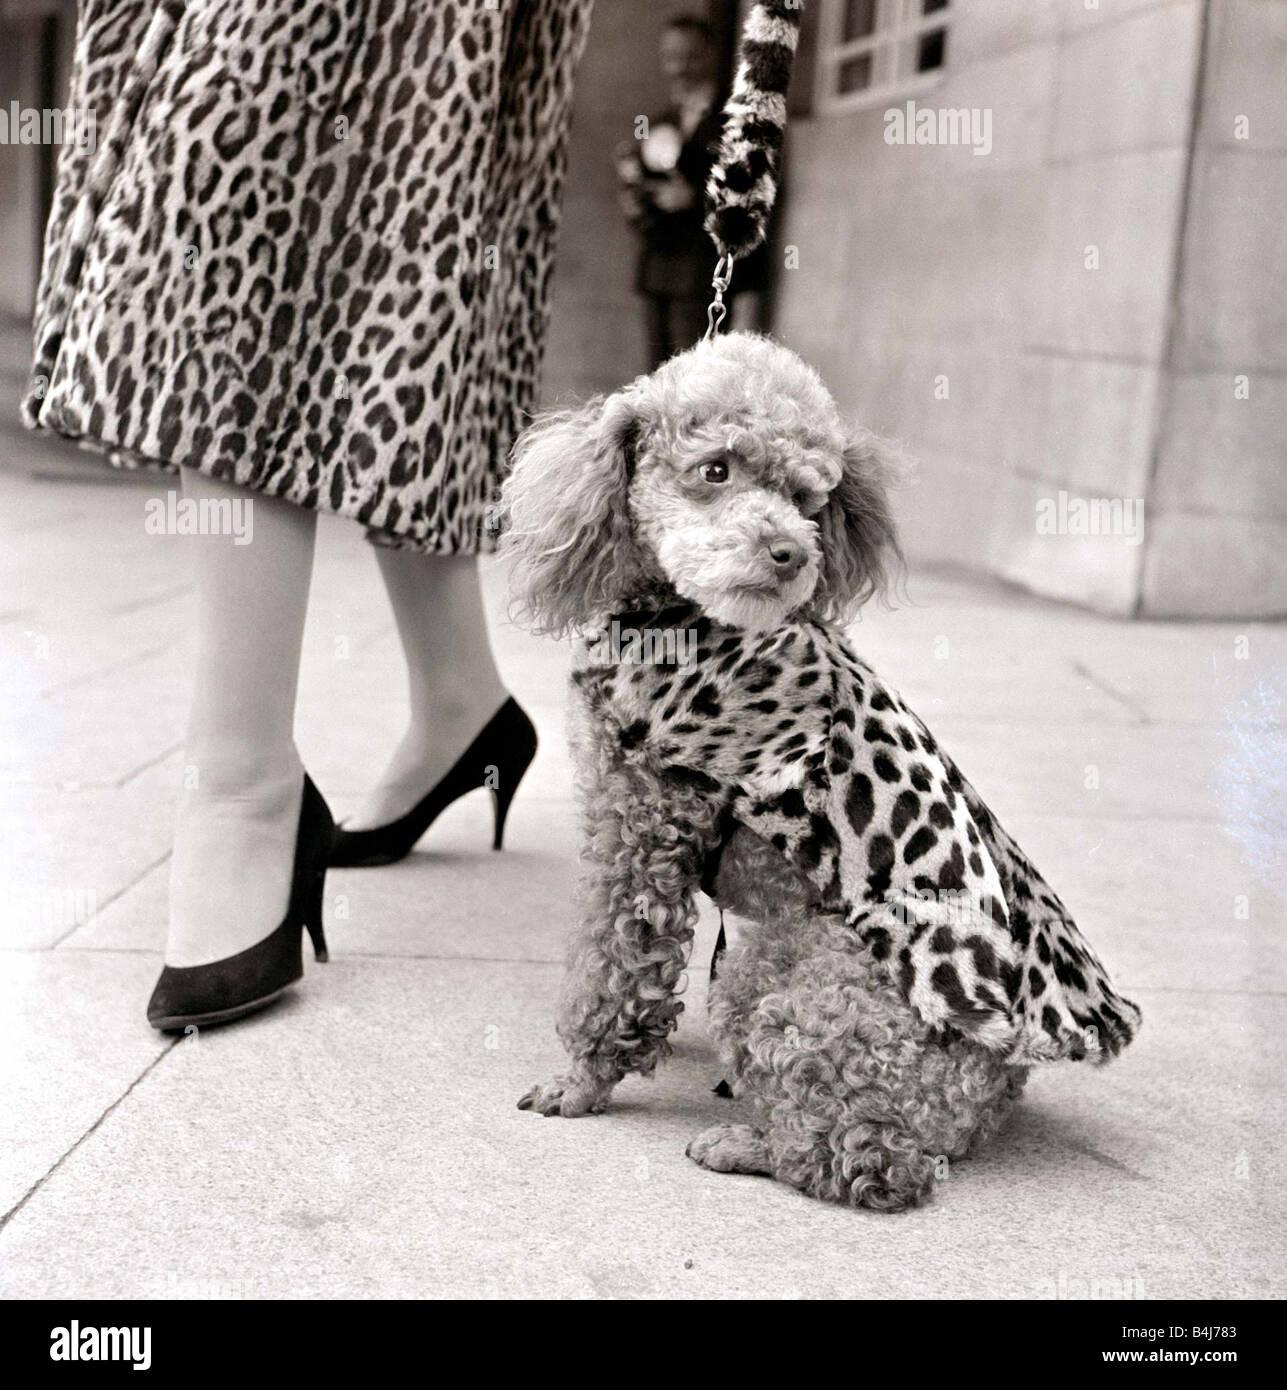 Abrigos de piel para perros caniche en Leopard print abrigo de pieles de septiembre de 1957 1950 Imagen De Stock